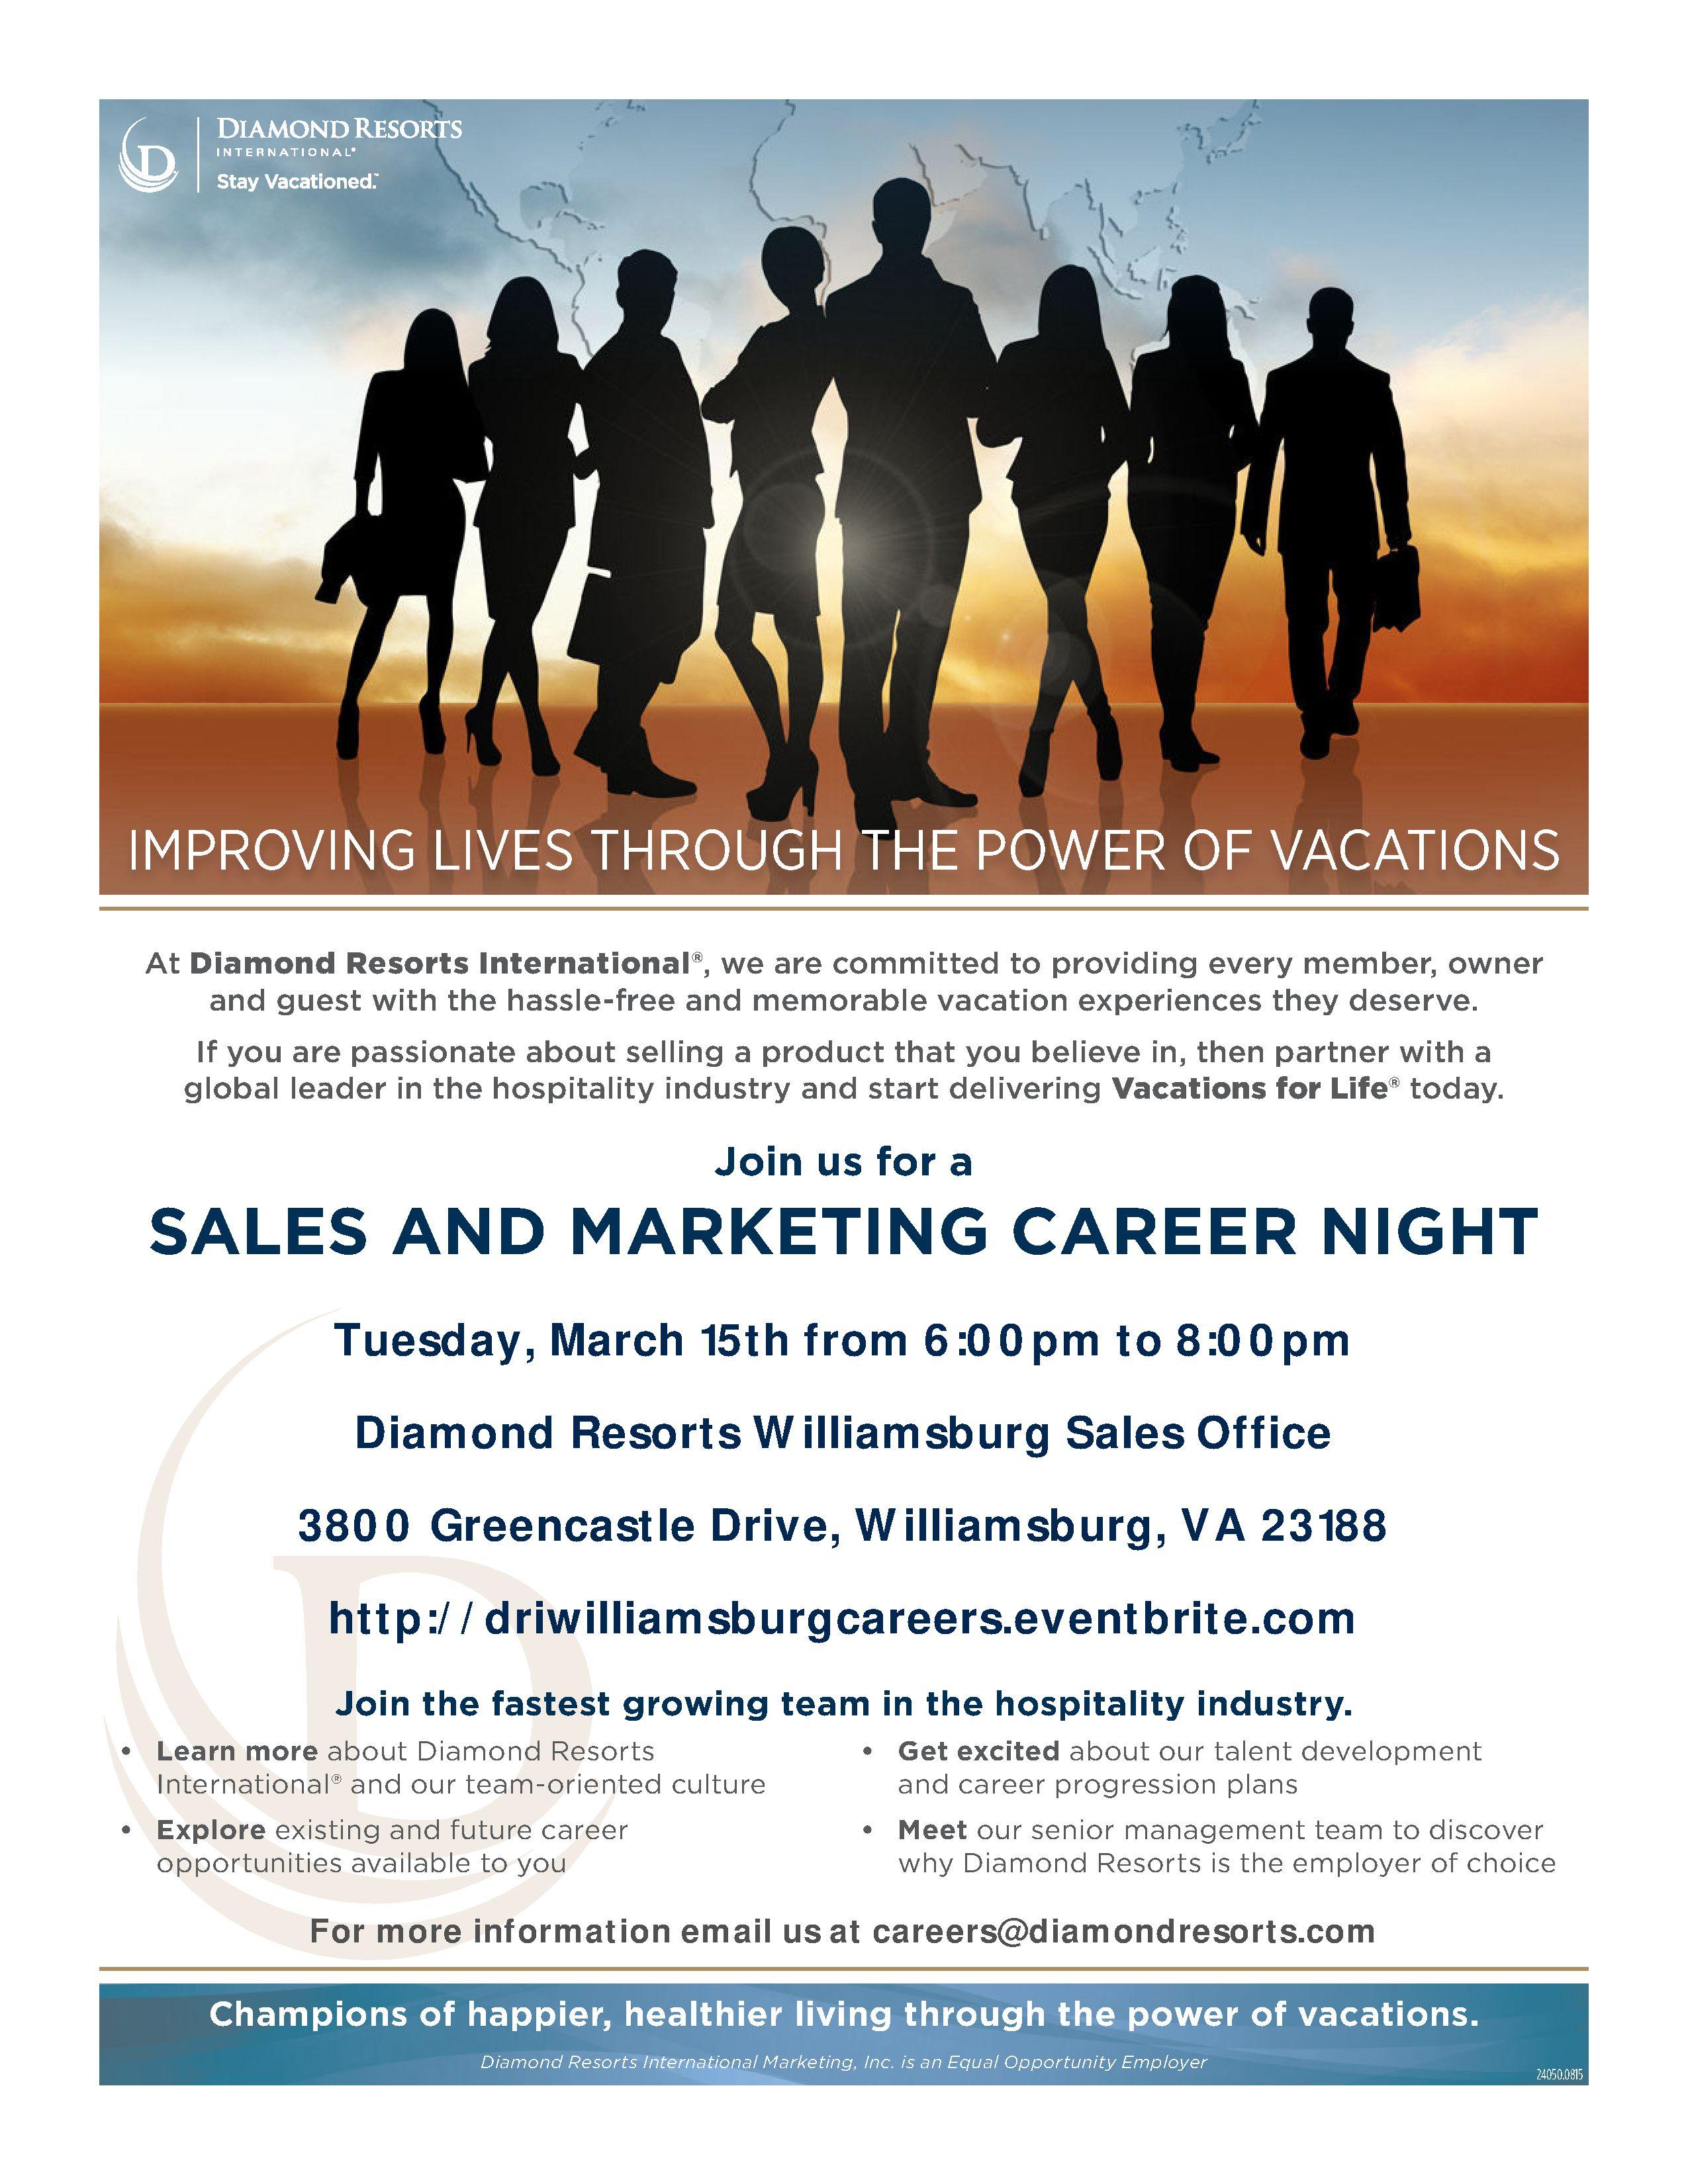 Williamsburg Sales and Marketing Career Night